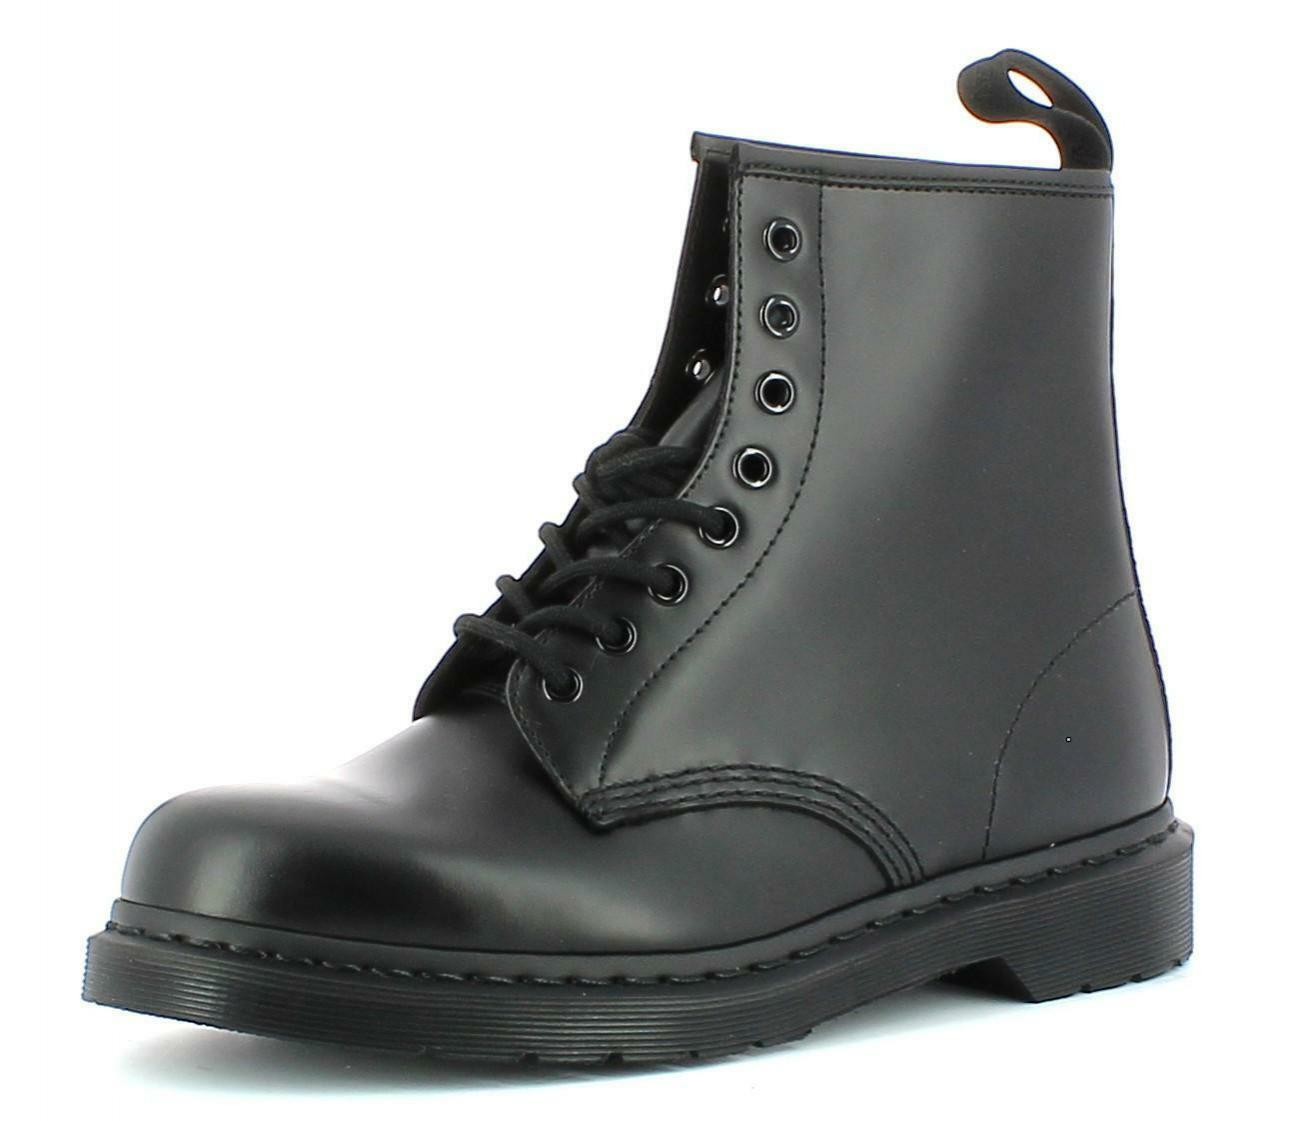 dr. martens scarponcini donna pelle neri